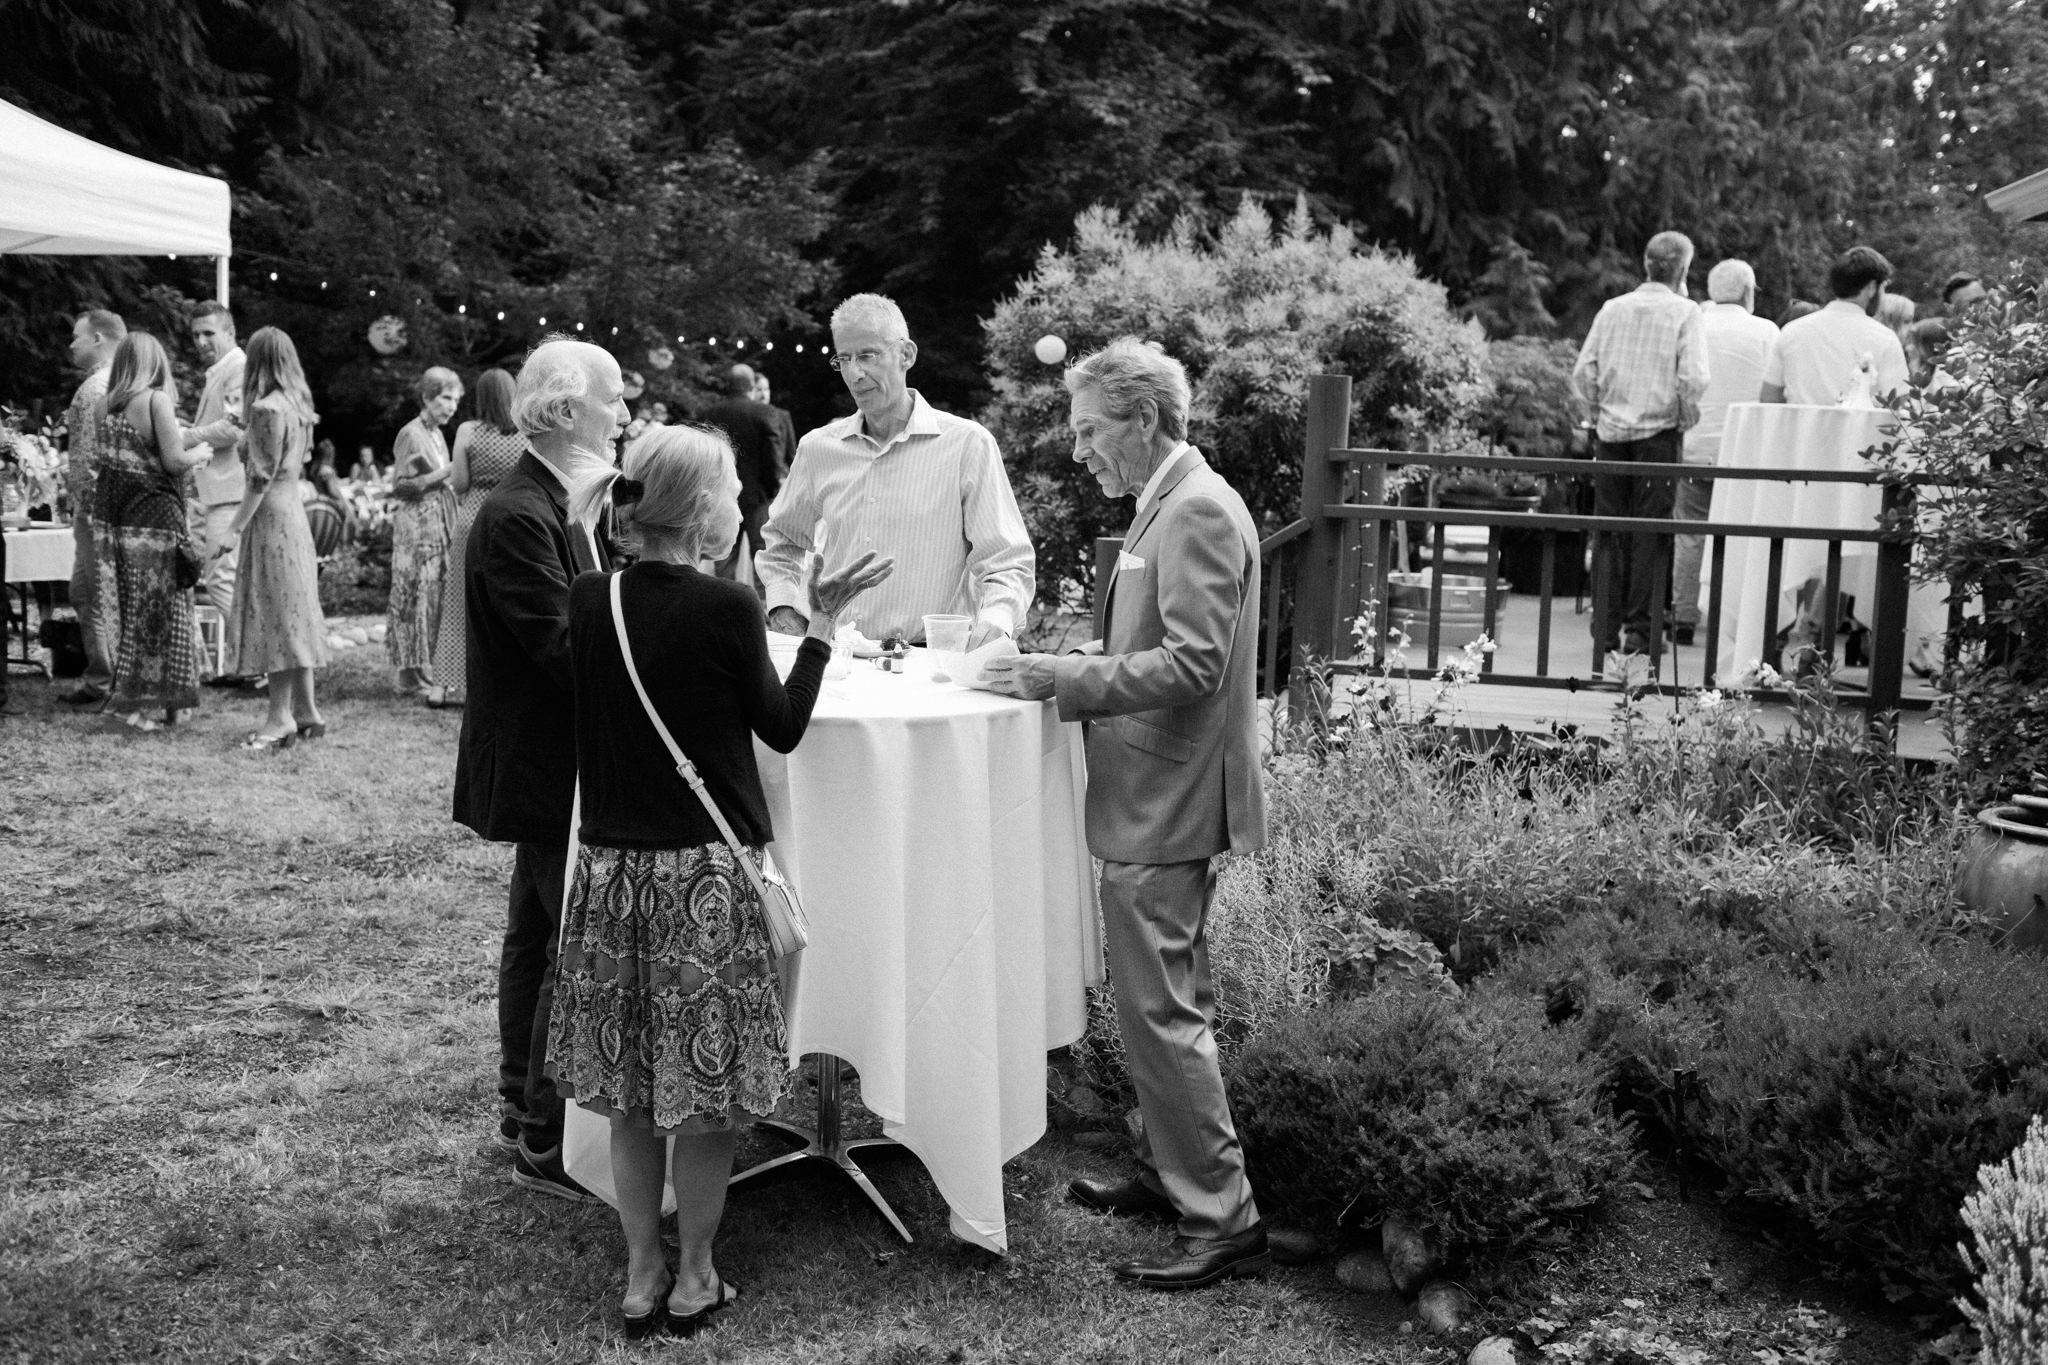 Backyard-Bainbridge-Island-Wedding-Alycia-Lovell-Photography-178.JPG